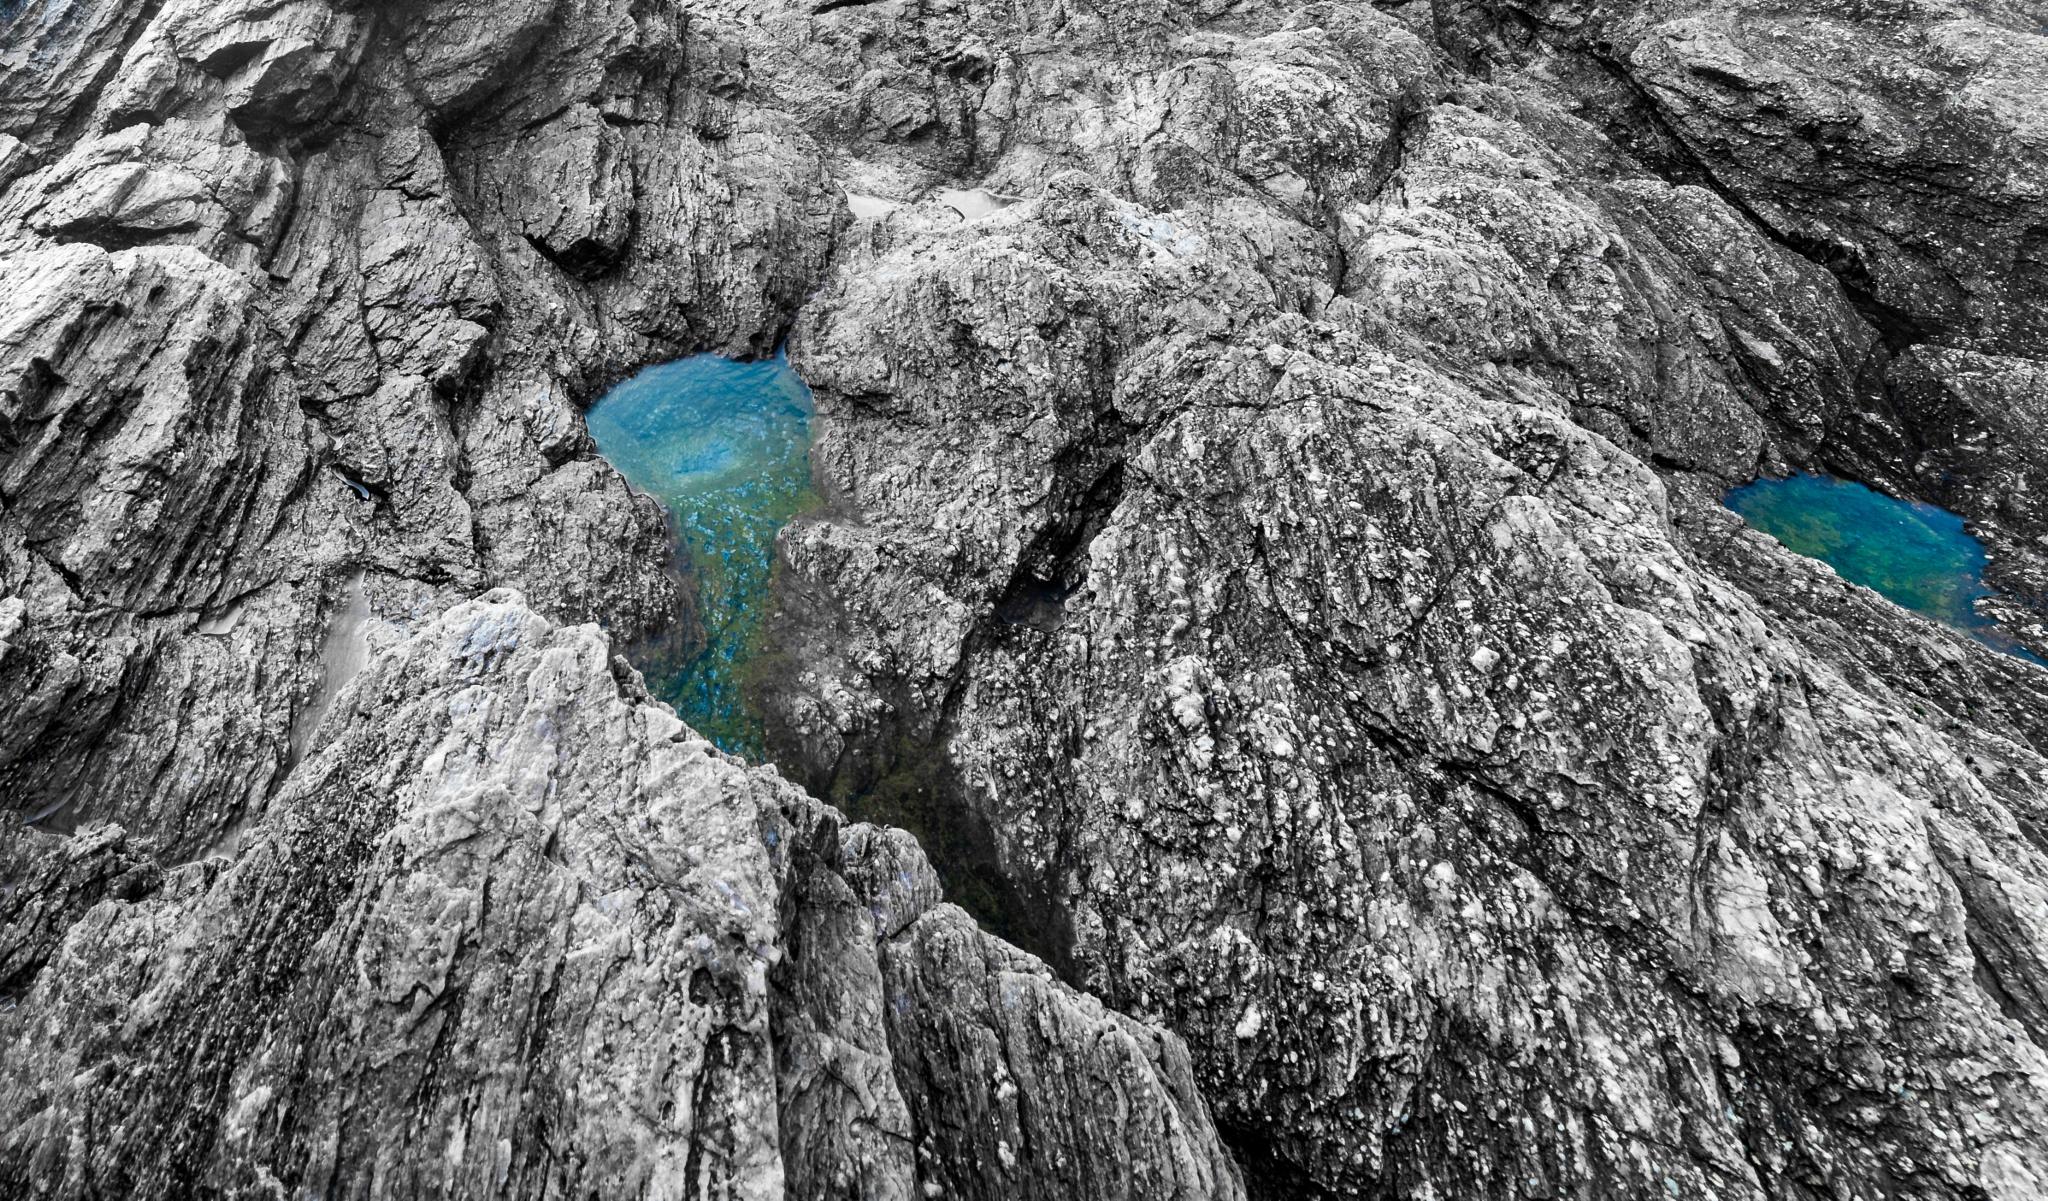 Blue by Djerdjour Mohamed Photography